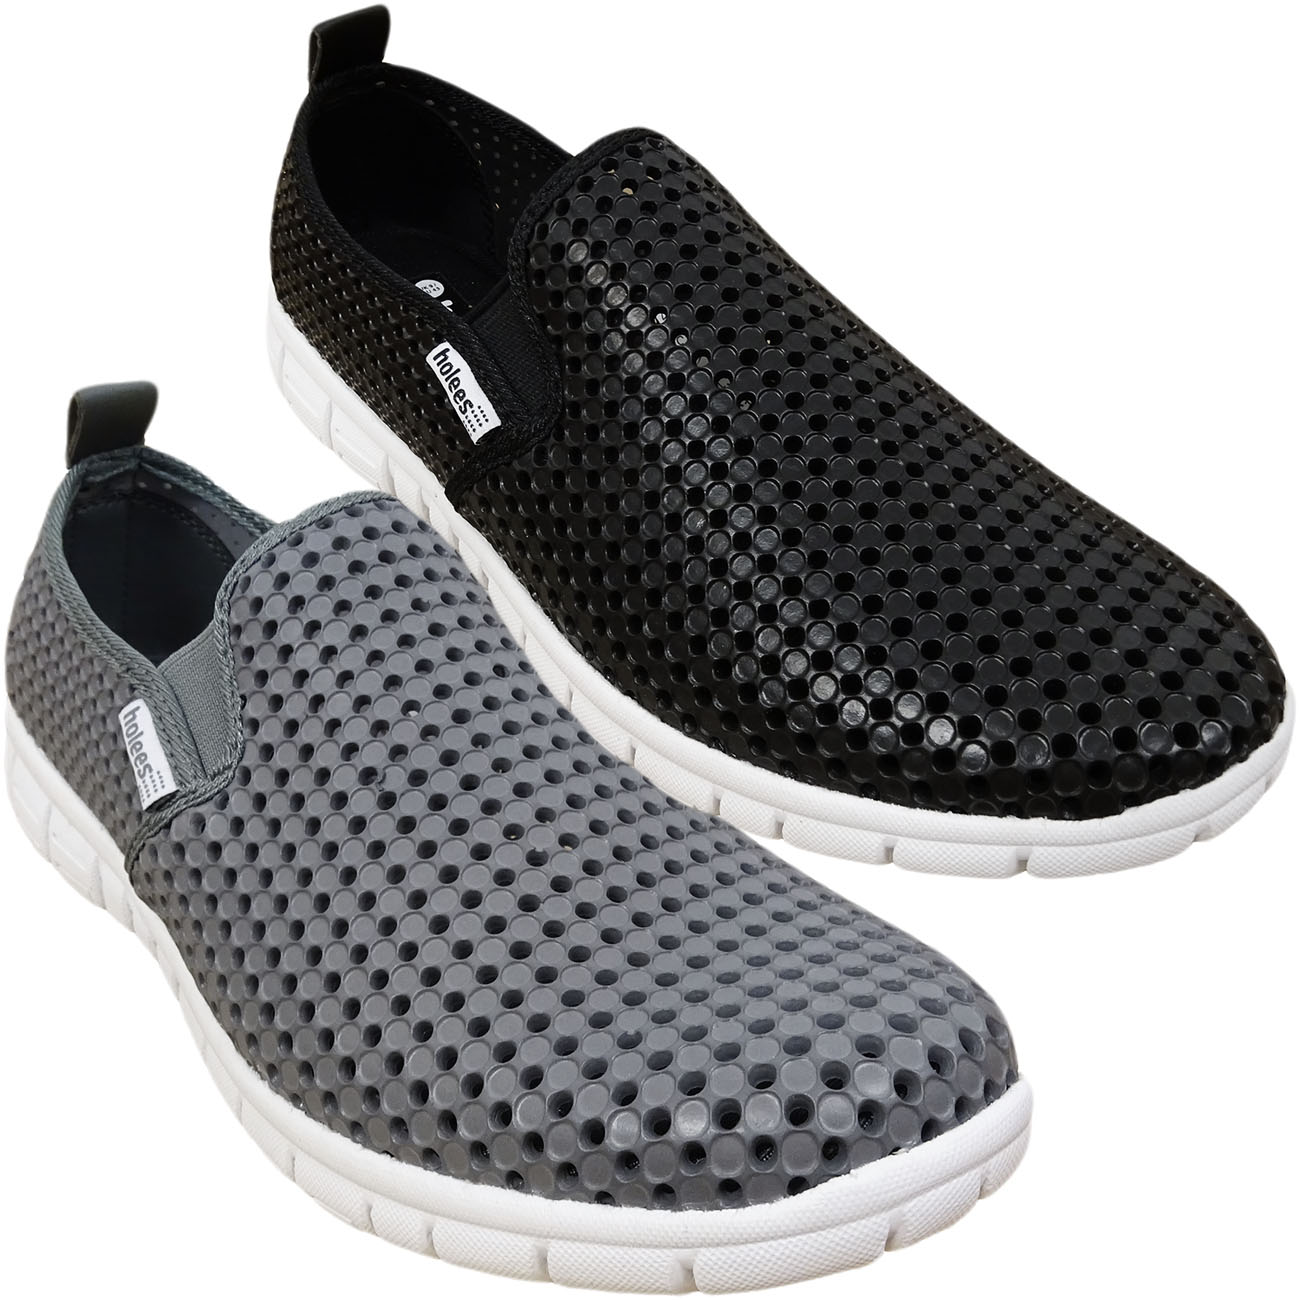 Holees Soft Trainer Footwear - Breathable Trainer